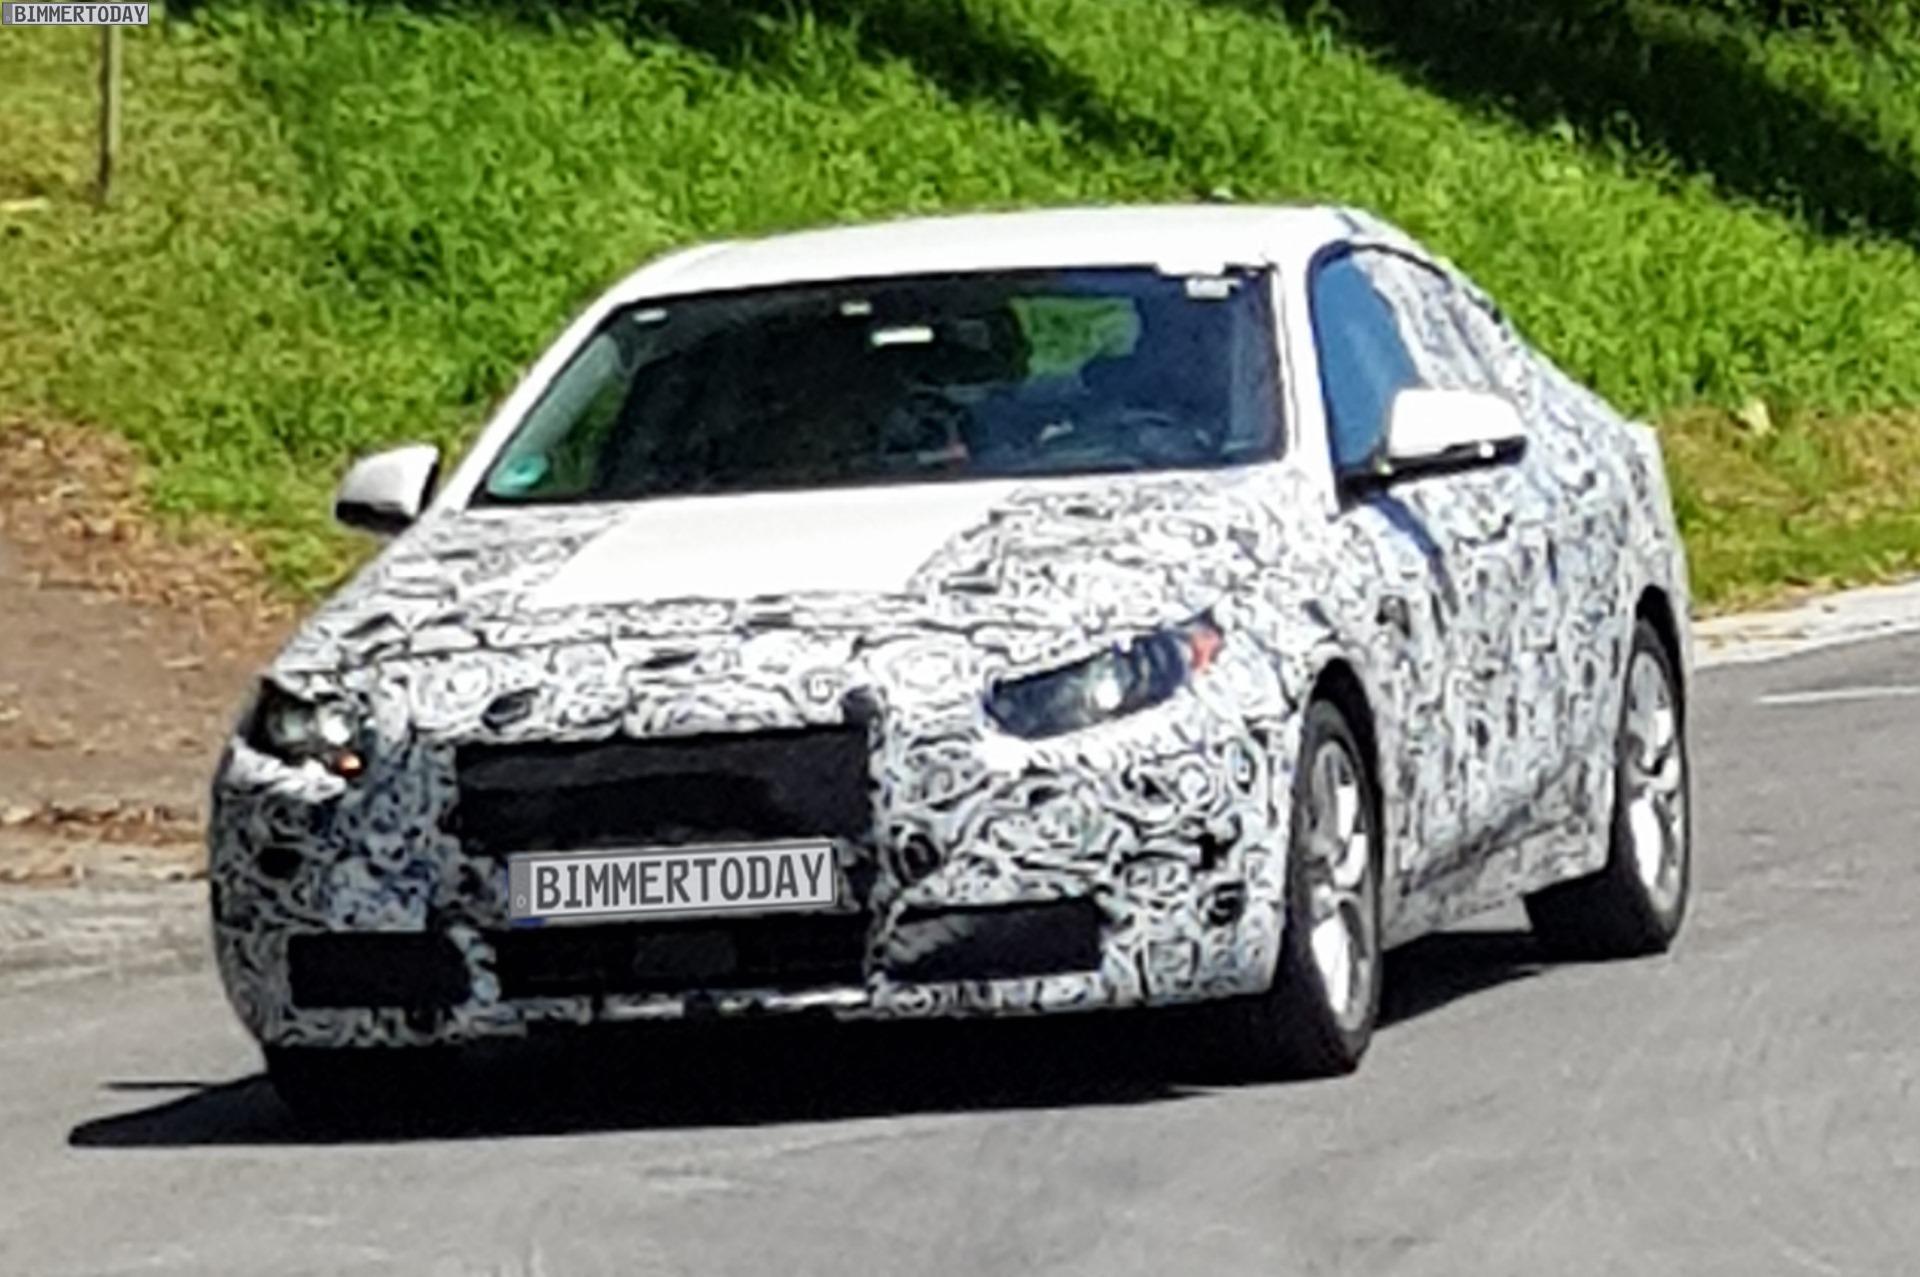 2019-BMW-2er-Gran-Coupe-F44-Erlkoenig-Spyshots-01